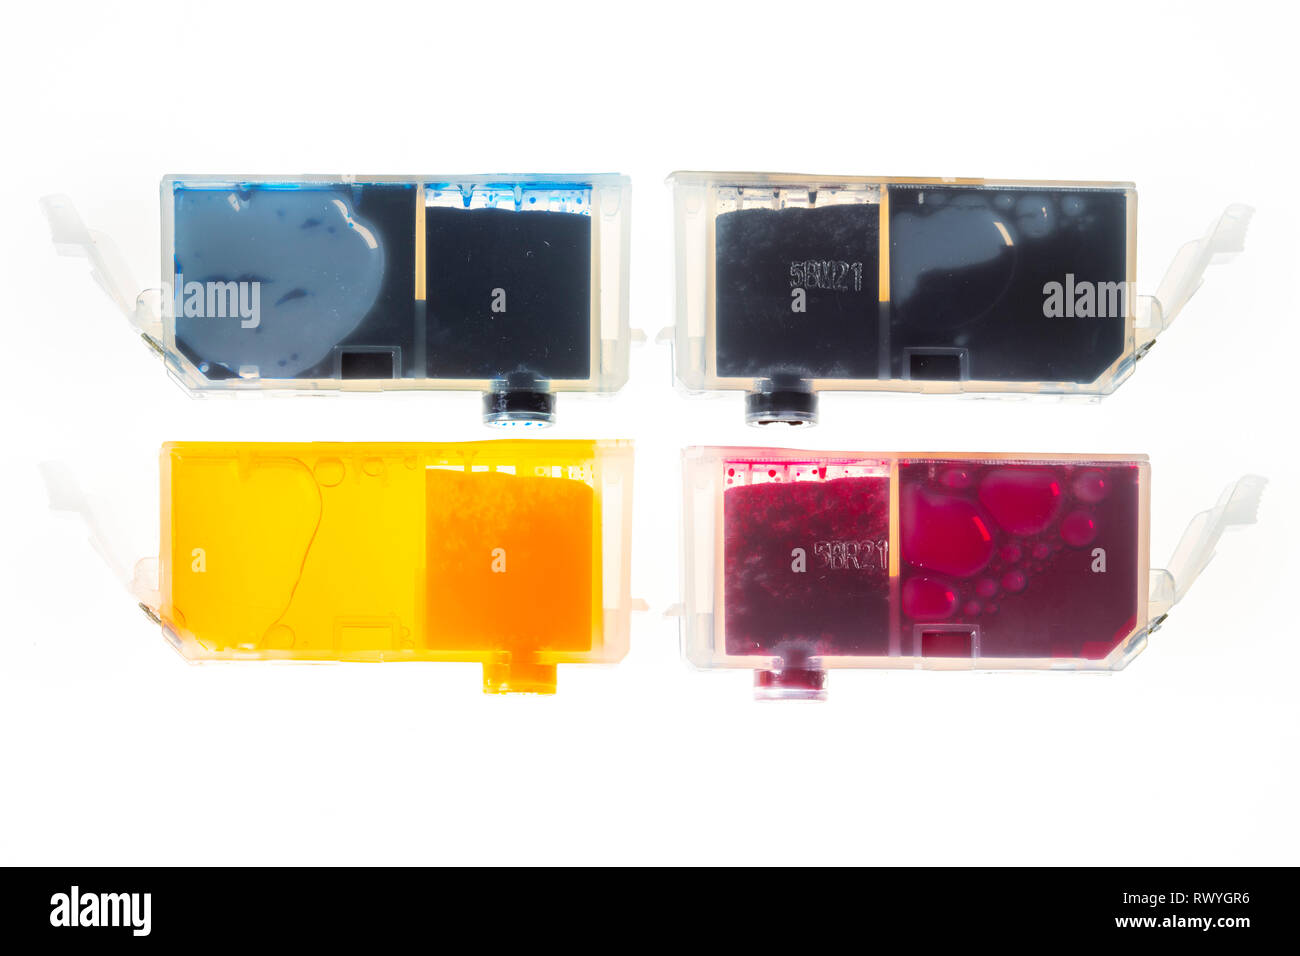 Printer Ink Cartridges, Full, - Stock Image